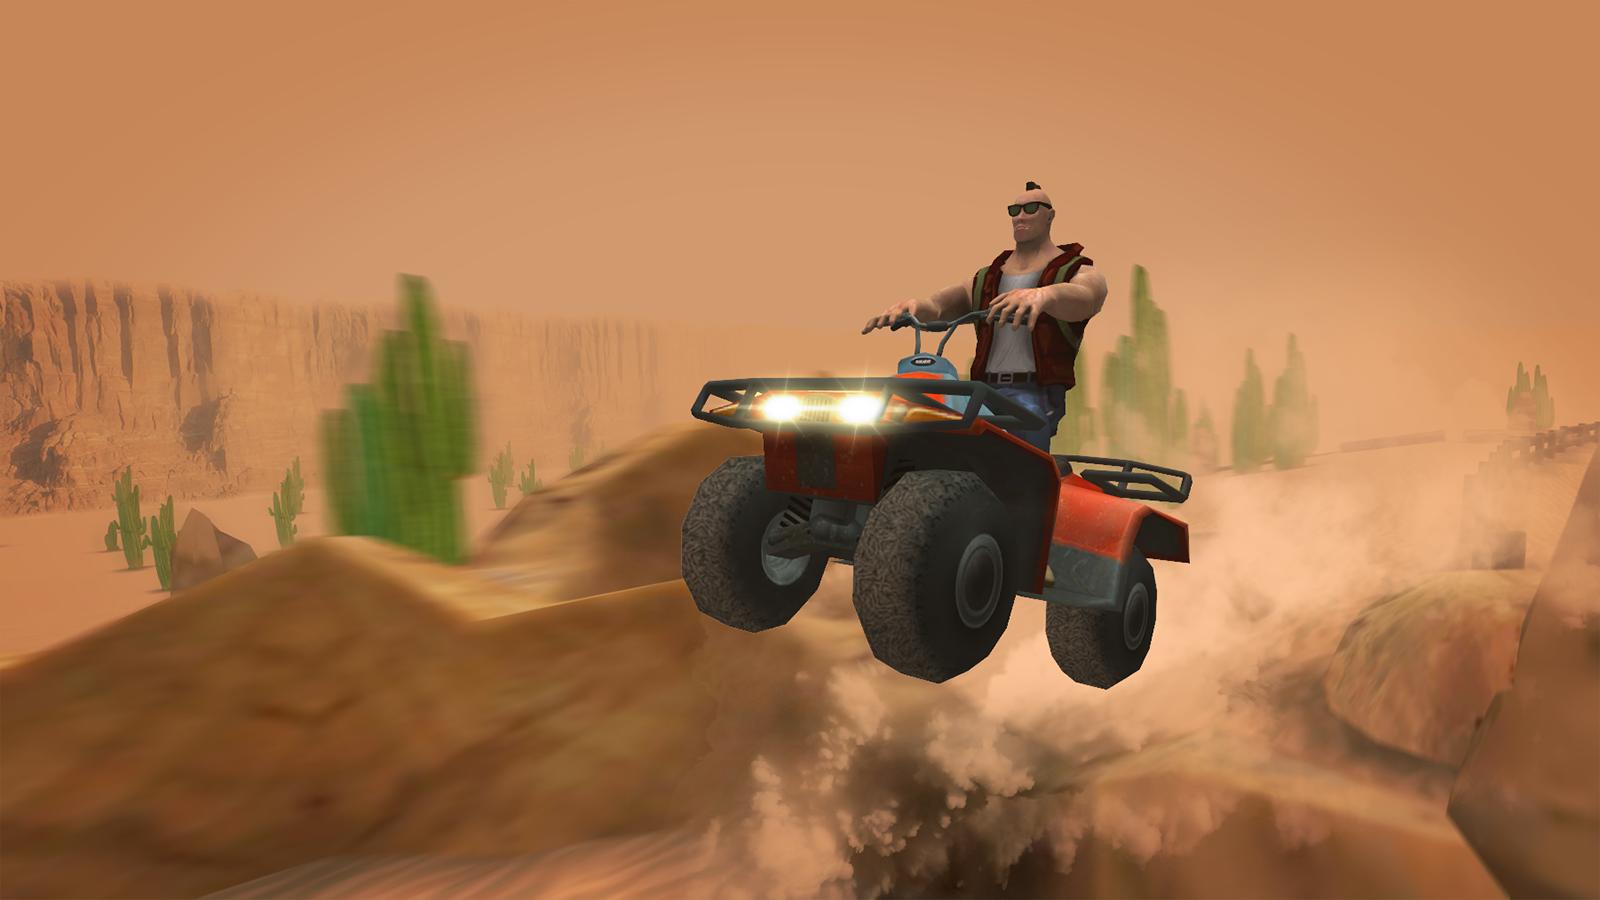 4x4-OffRoad-Desert-ATV 10